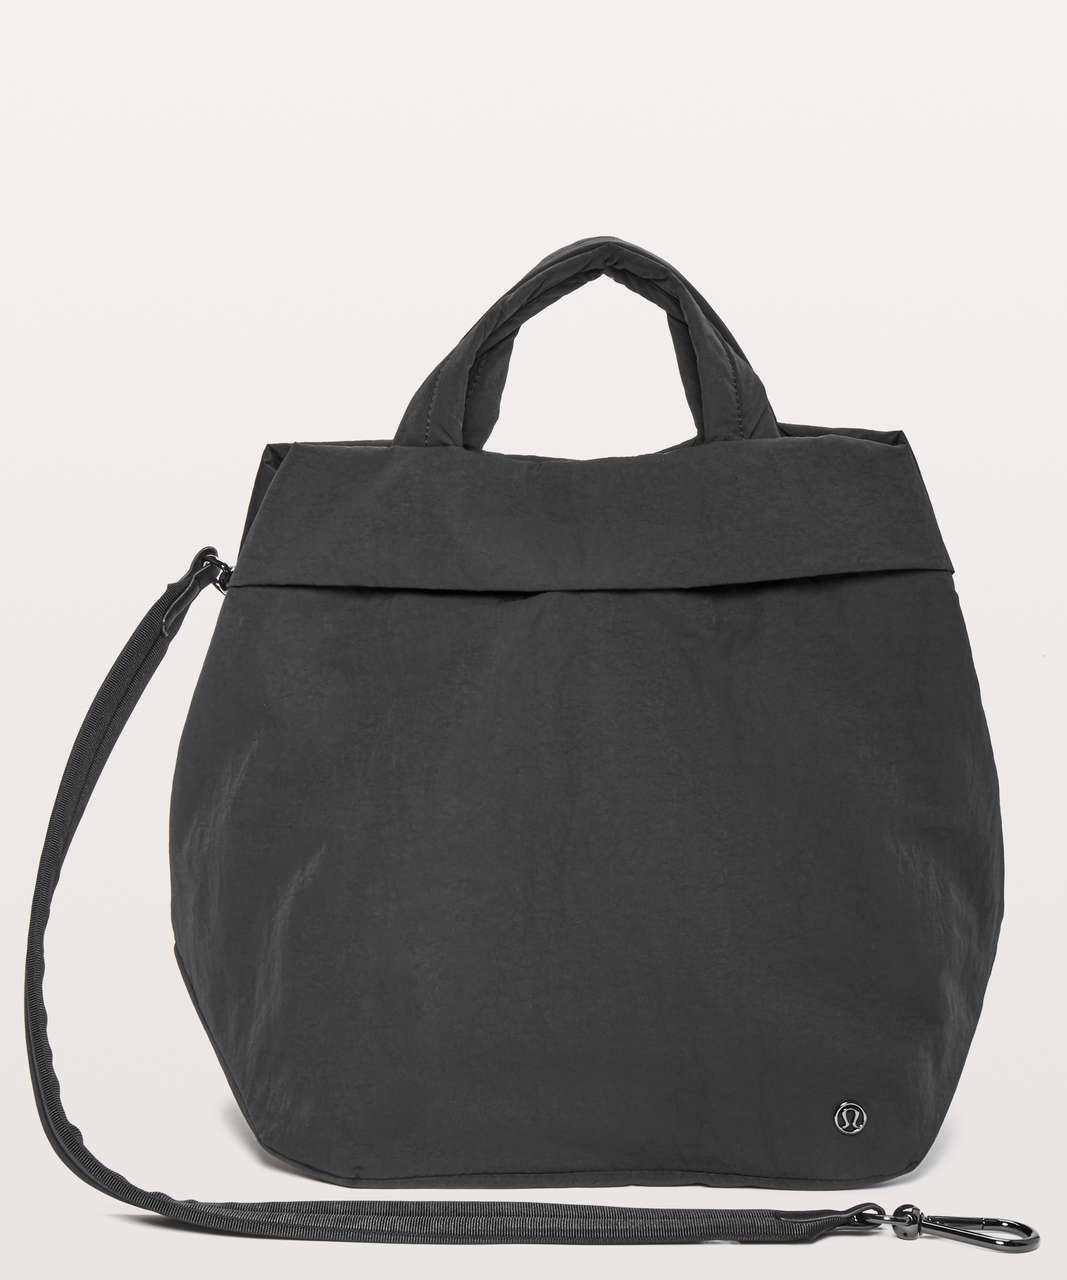 4210055bf1e Lululemon On My Level Bag *19L - Black - lulu fanatics